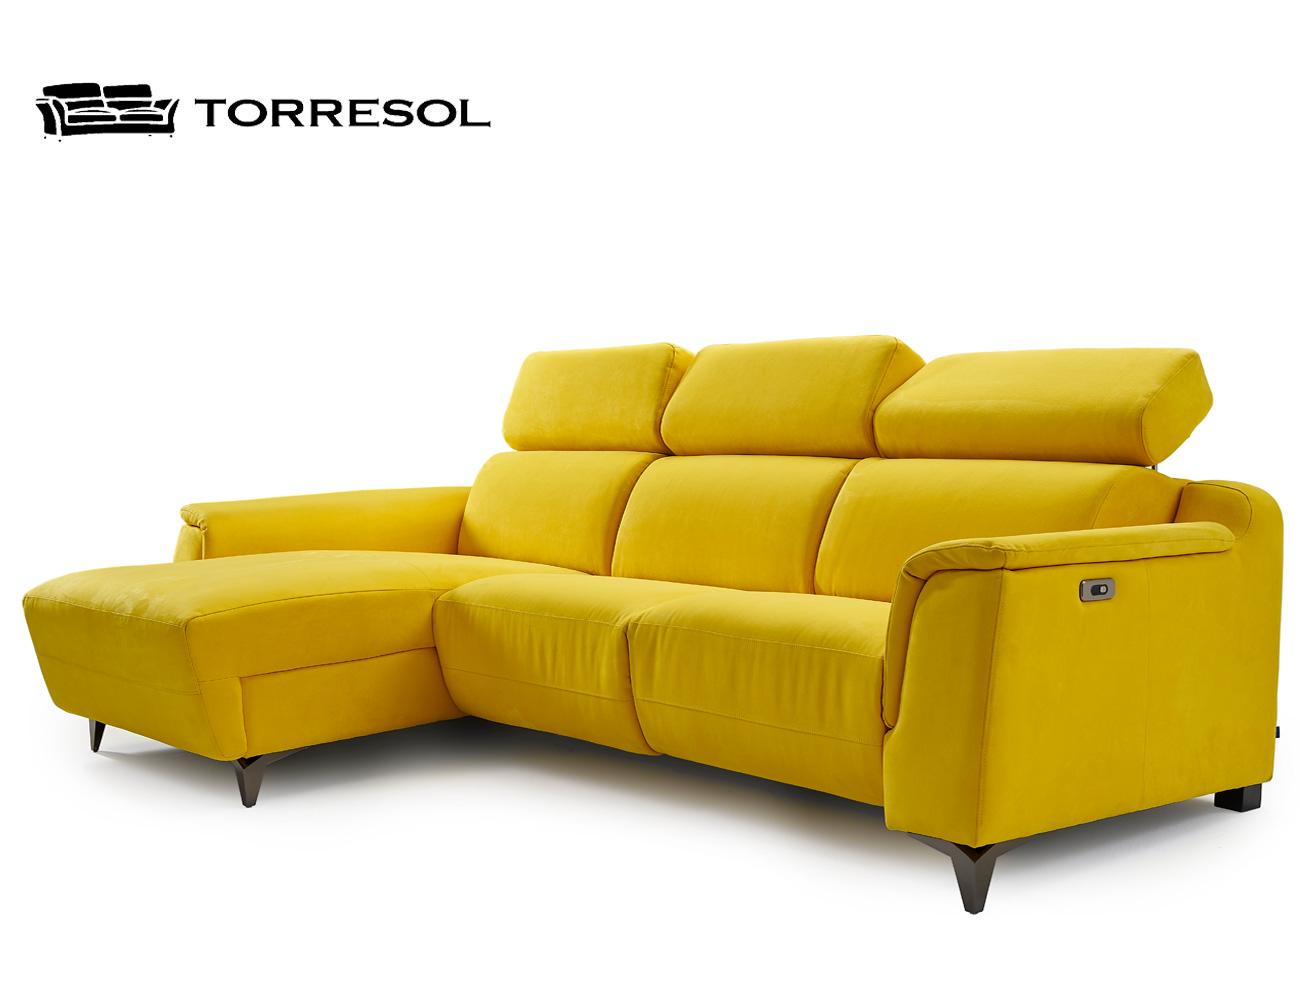 Sofa ralph torresol 5